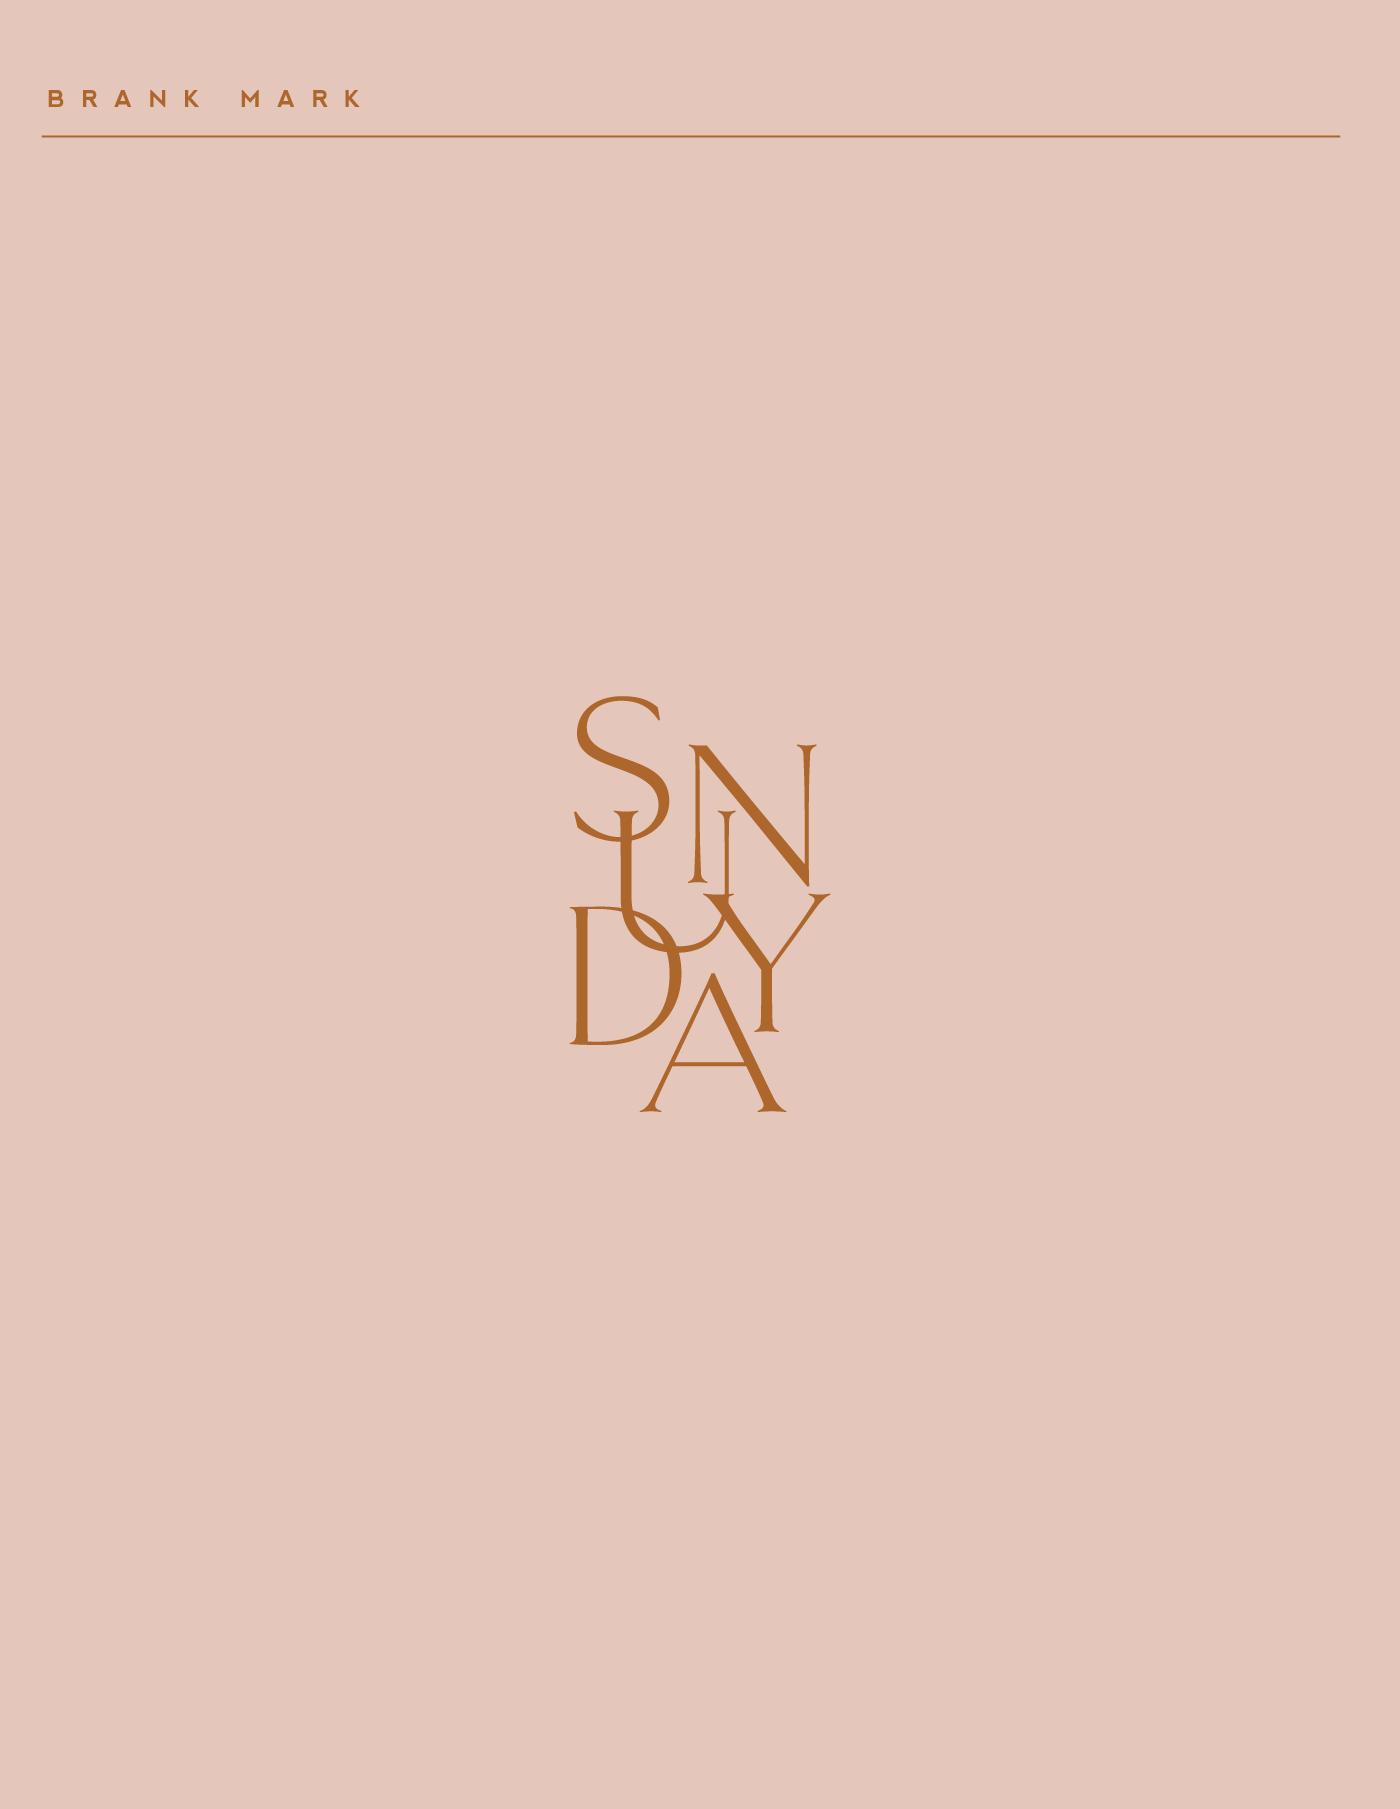 Calligraphy Premade Brand & Logo Design Kits for Creative Businesses, Stylish and Chic Social Media Templates, Saffron Avenue, www.shopsaffronavenue.com